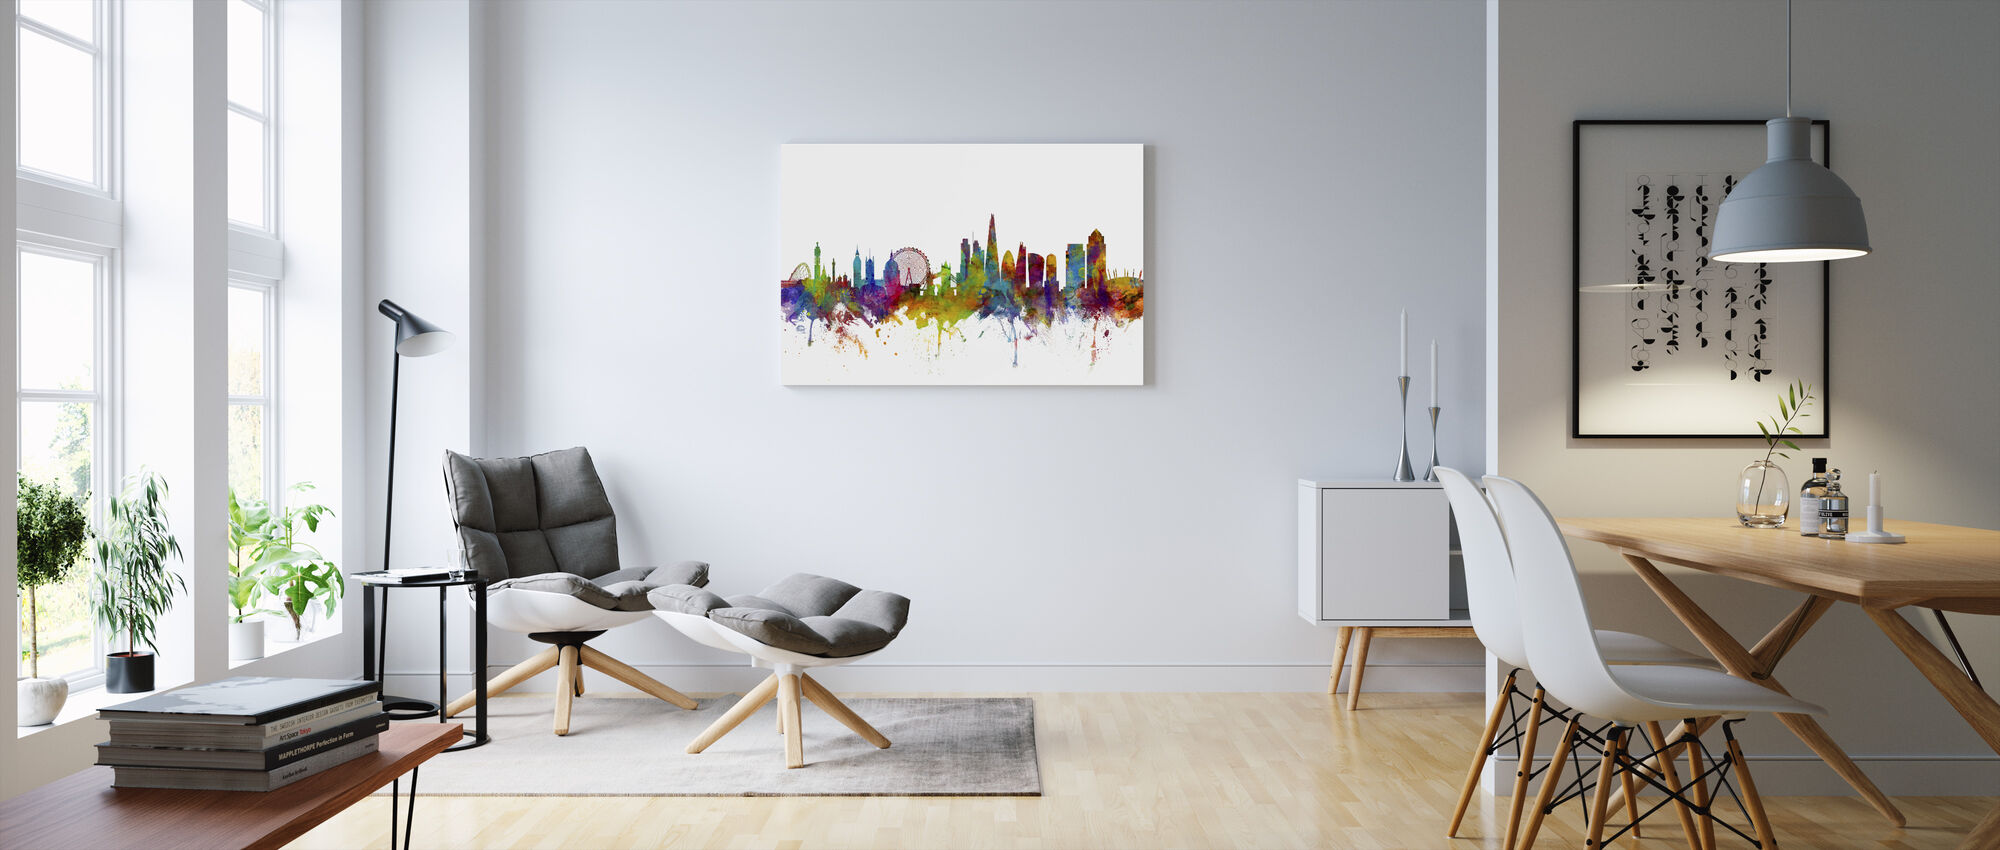 Panorama London Canary Wharf - Obraz na płótnie - Pokój dzienny